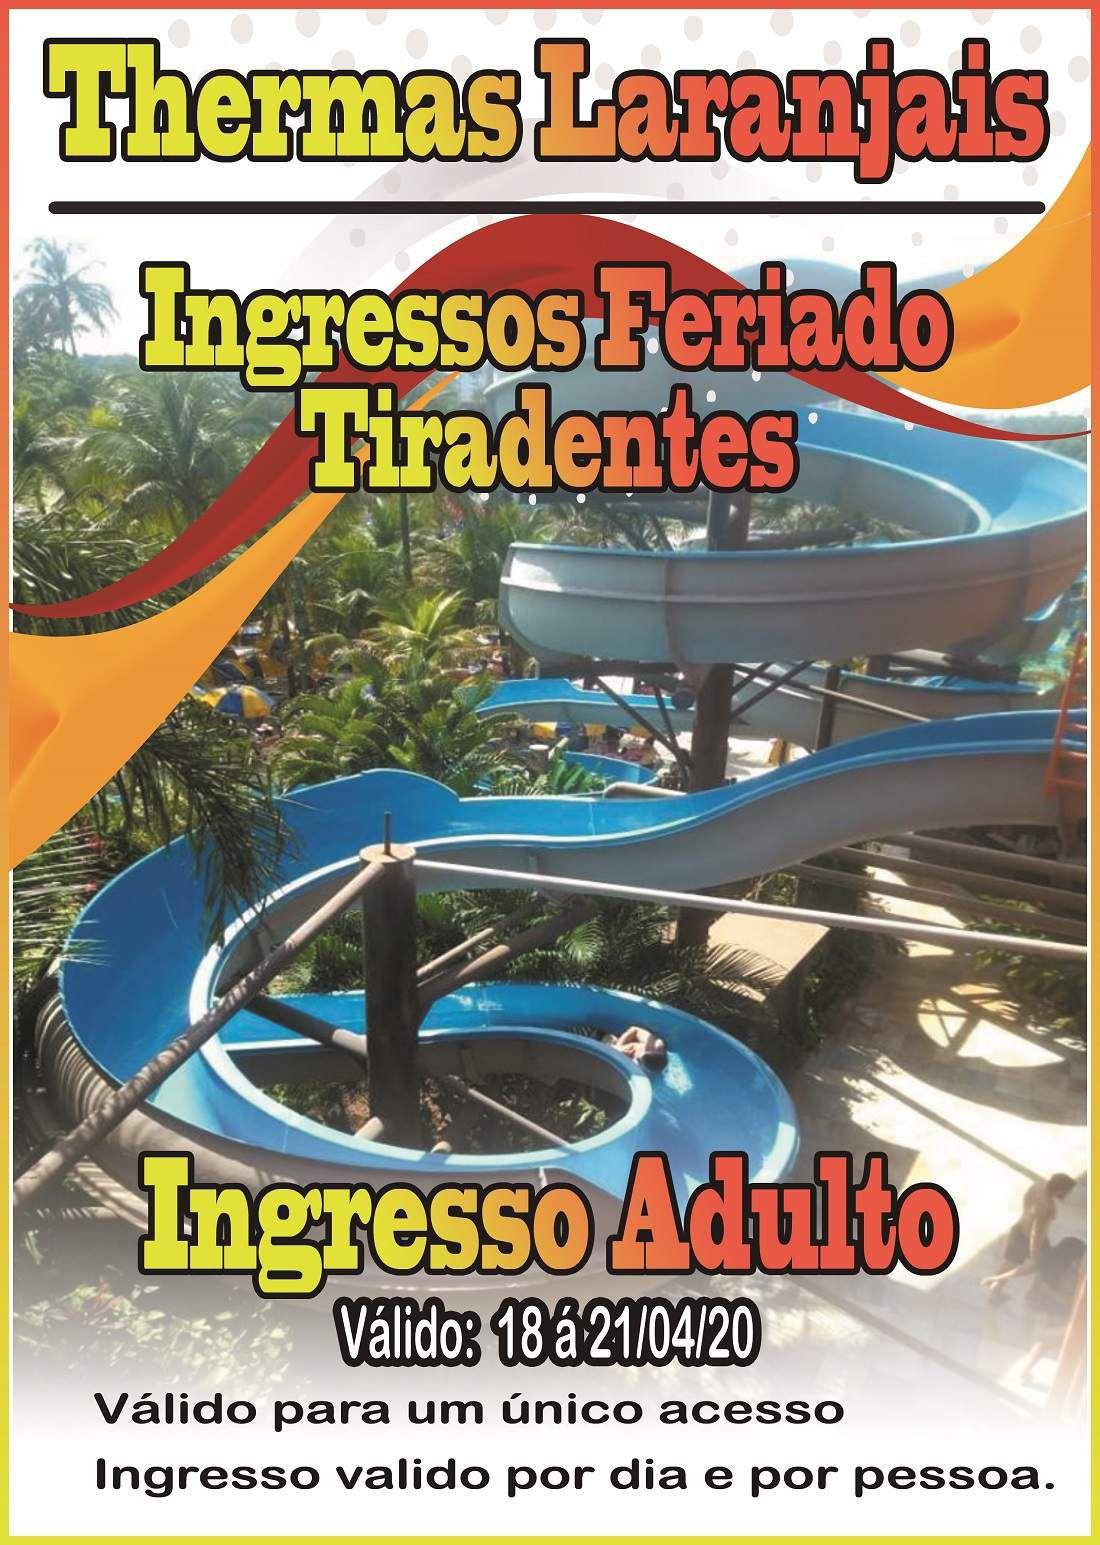 Ingresso Adulto - Tirandetes - Thermas dos Laranjais  - Thermas Fácil